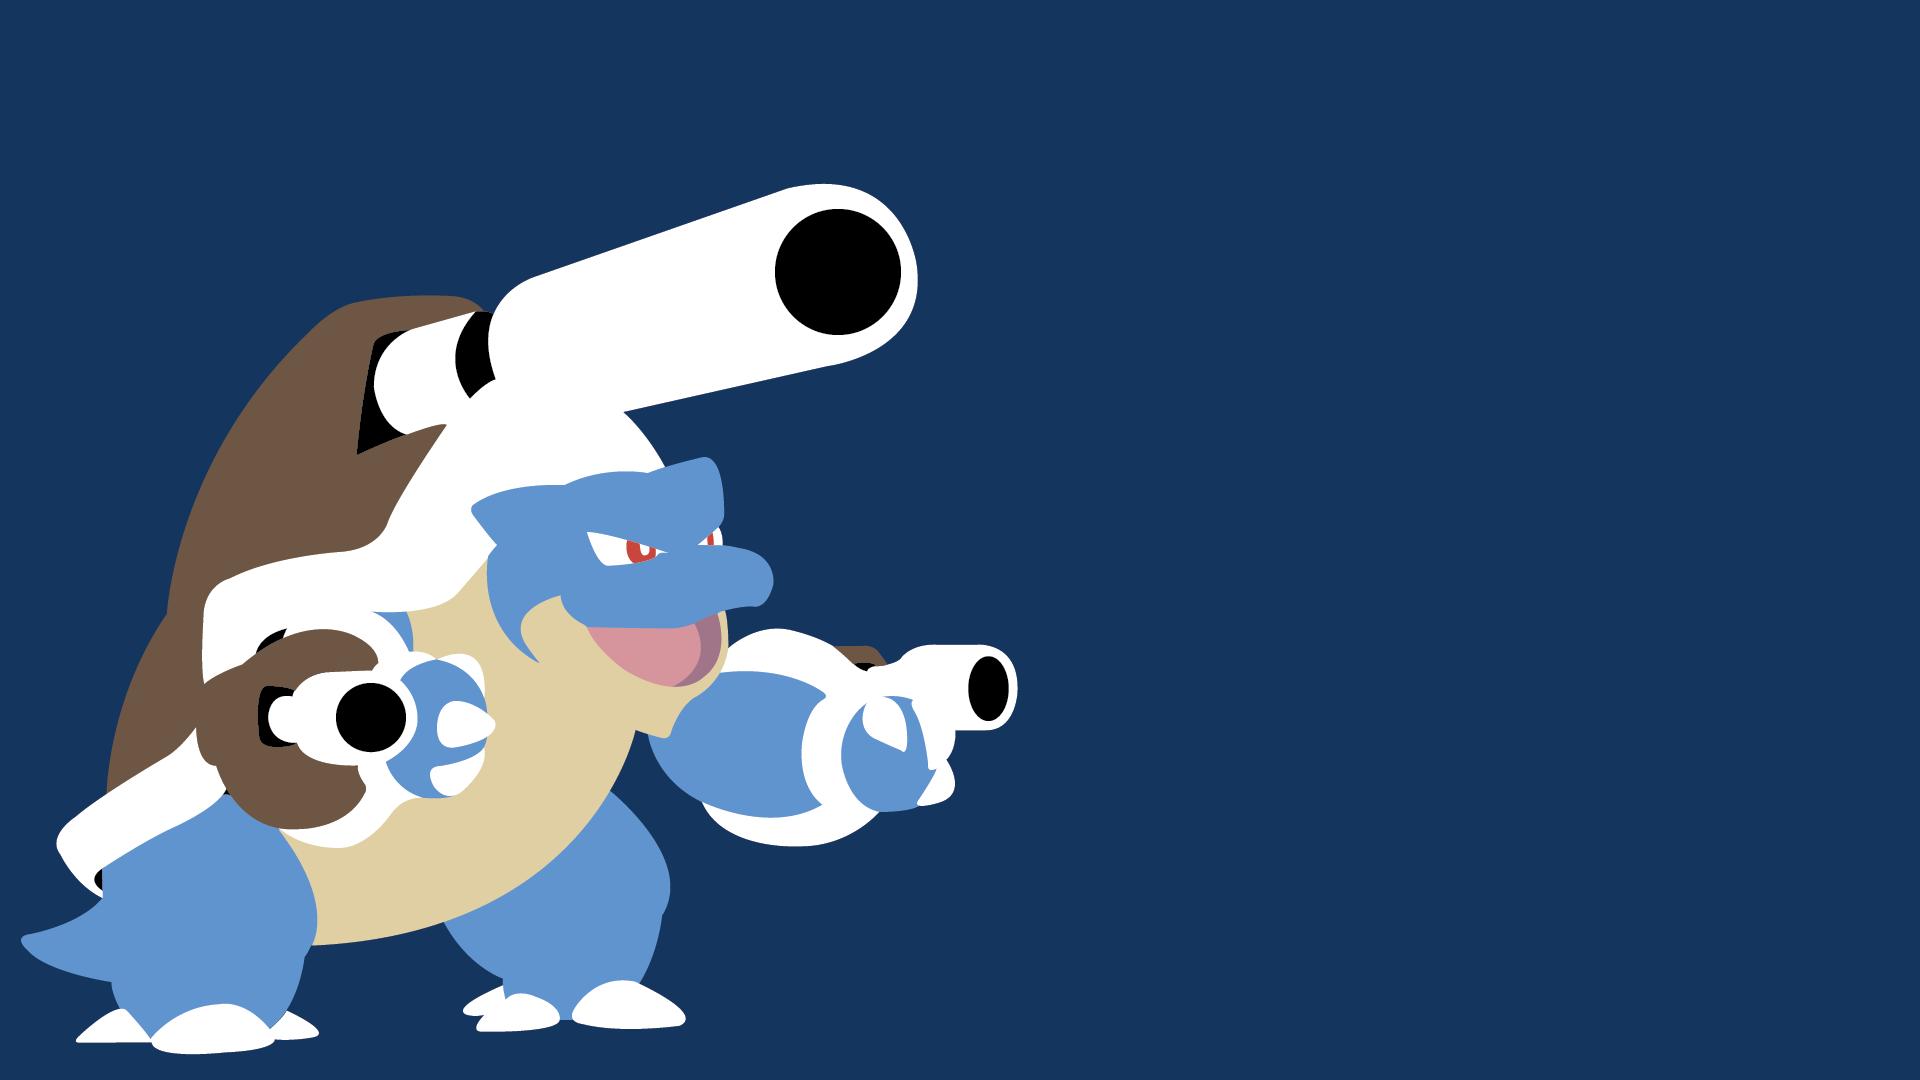 pokemon mega blastoise wallpaper wwwpixsharkcom